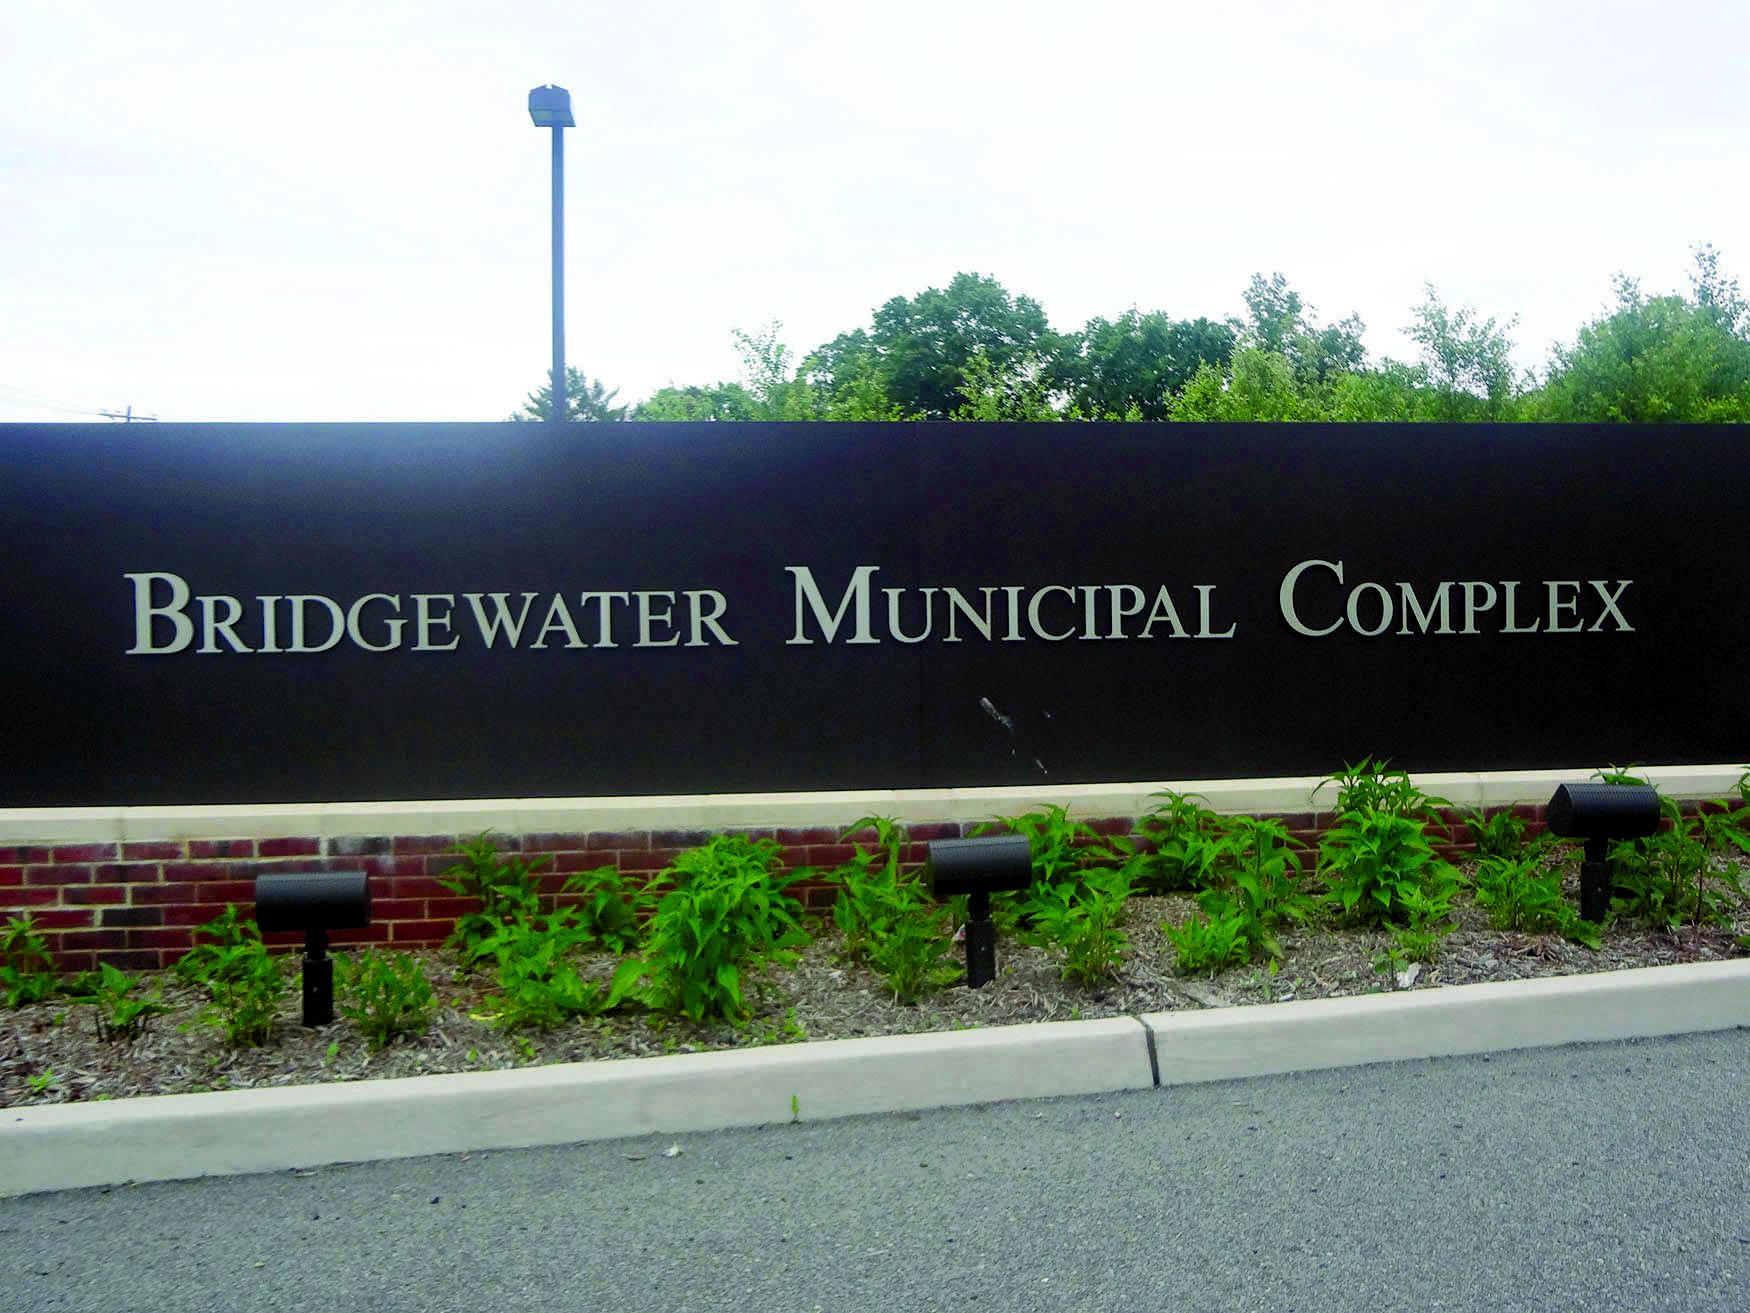 3178943c5a897937c687_Bridgewater_municipal.jpg